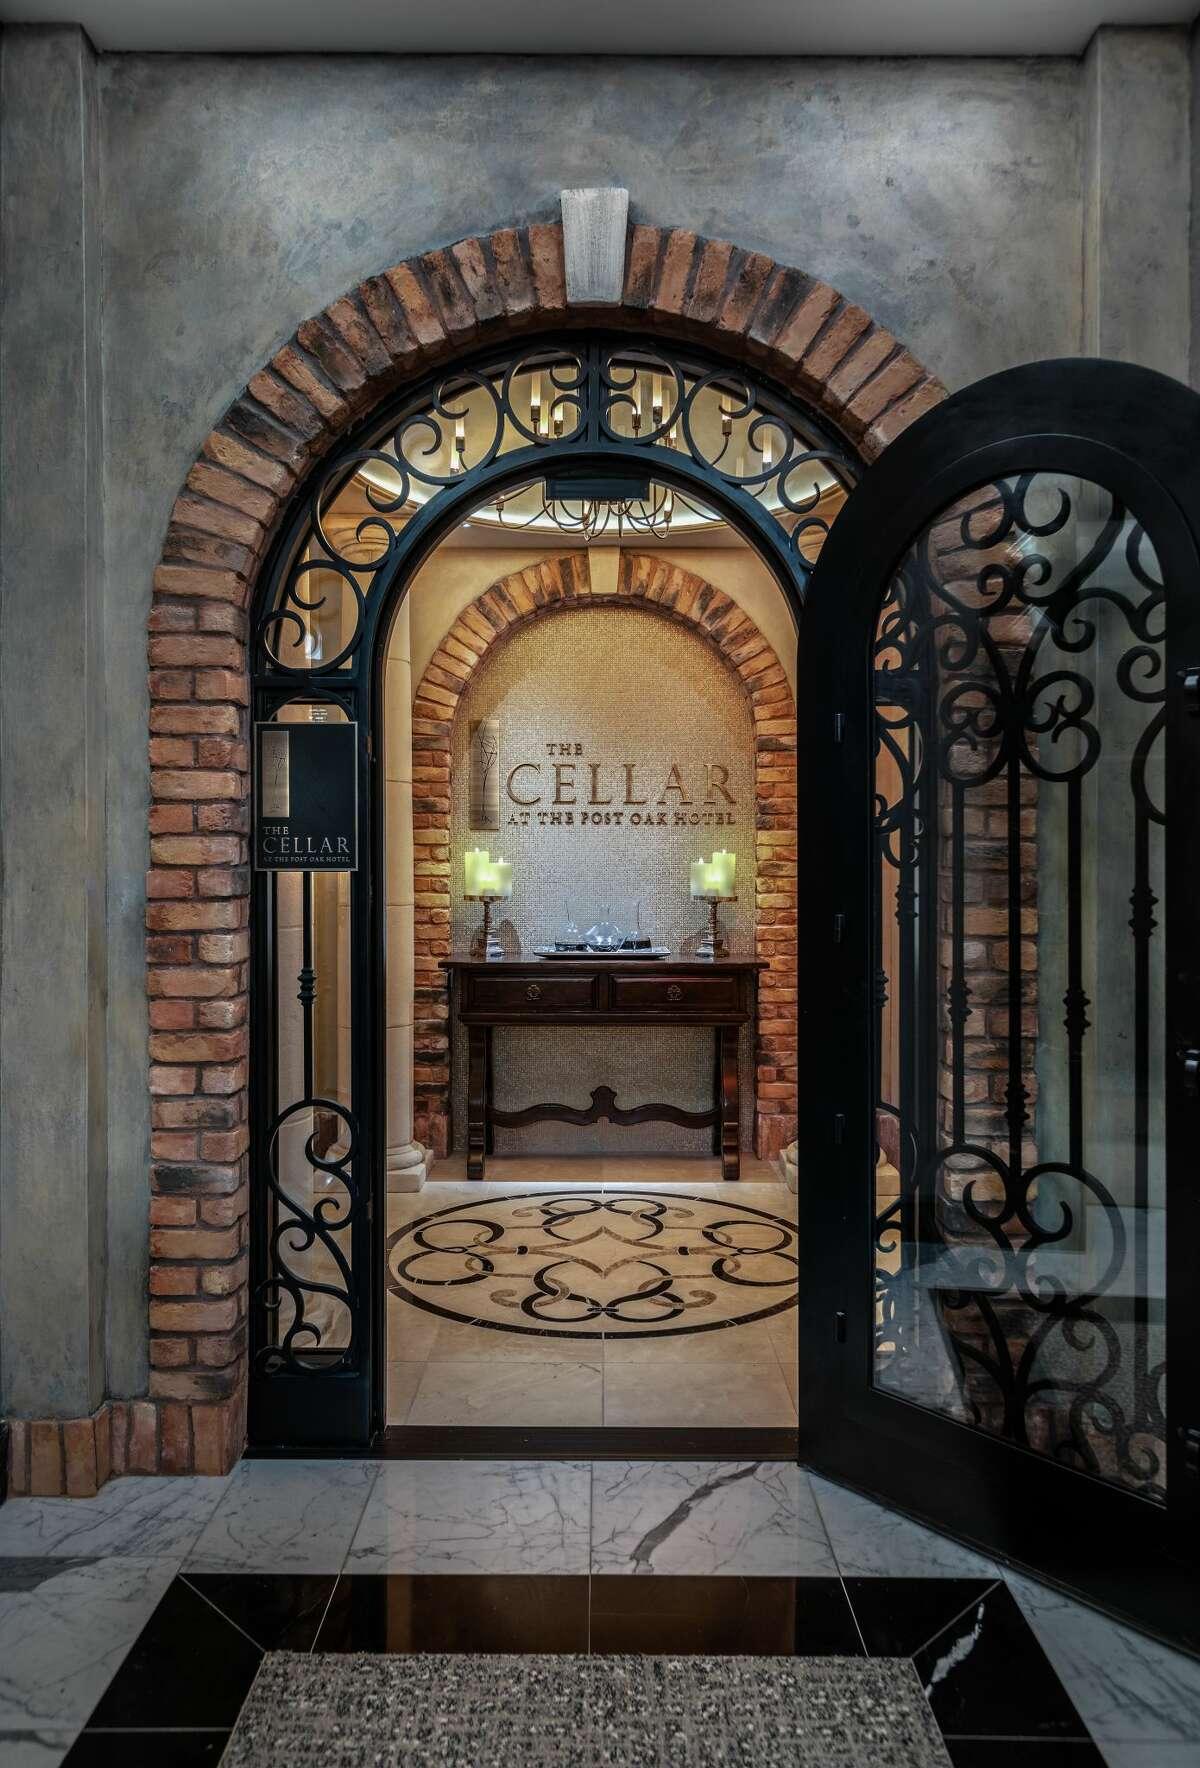 A new wine vault with more than $3 million of inventory is now open at Houston billionaire Tilman Fertitta's local AAA Five-Diamond hotel.